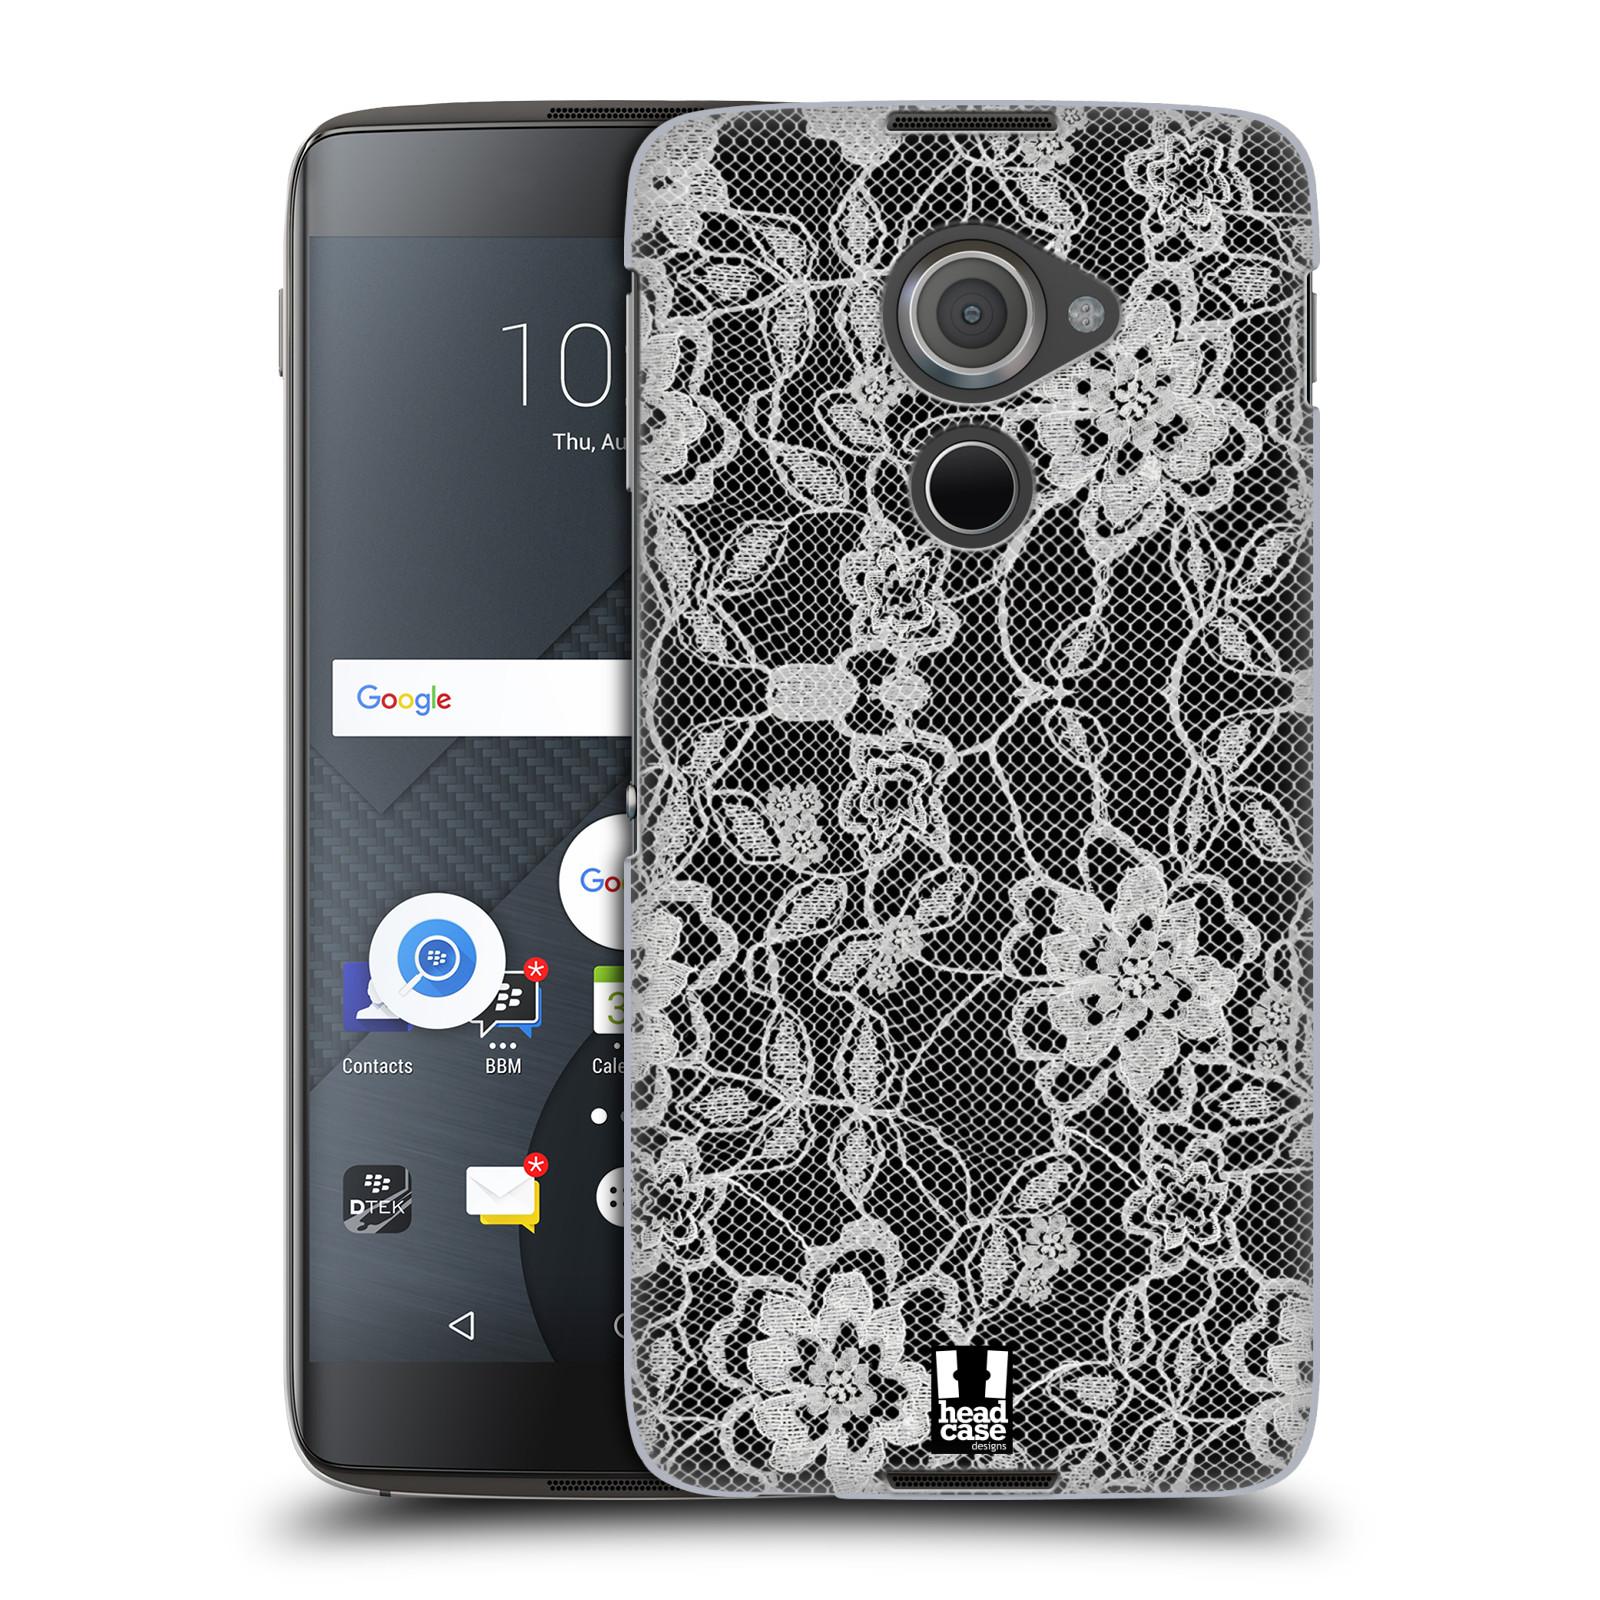 Plastové pouzdro na mobil Blackberry DTEK60 (Argon) - Head Case FLOWERY KRAJKA